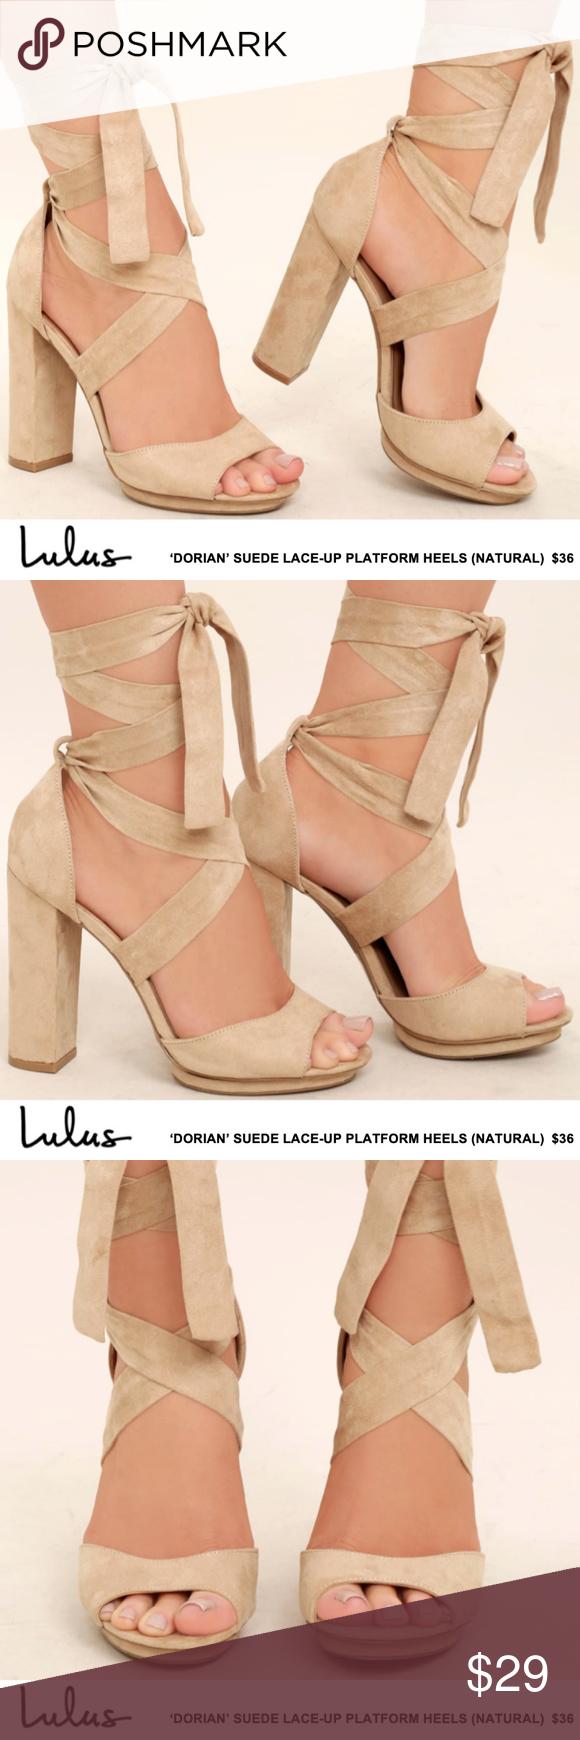 70c746a007b NWOT: Lulus - 'Dorian' Suede Lace-Up Platform Heel 'Dorian' Suede ...